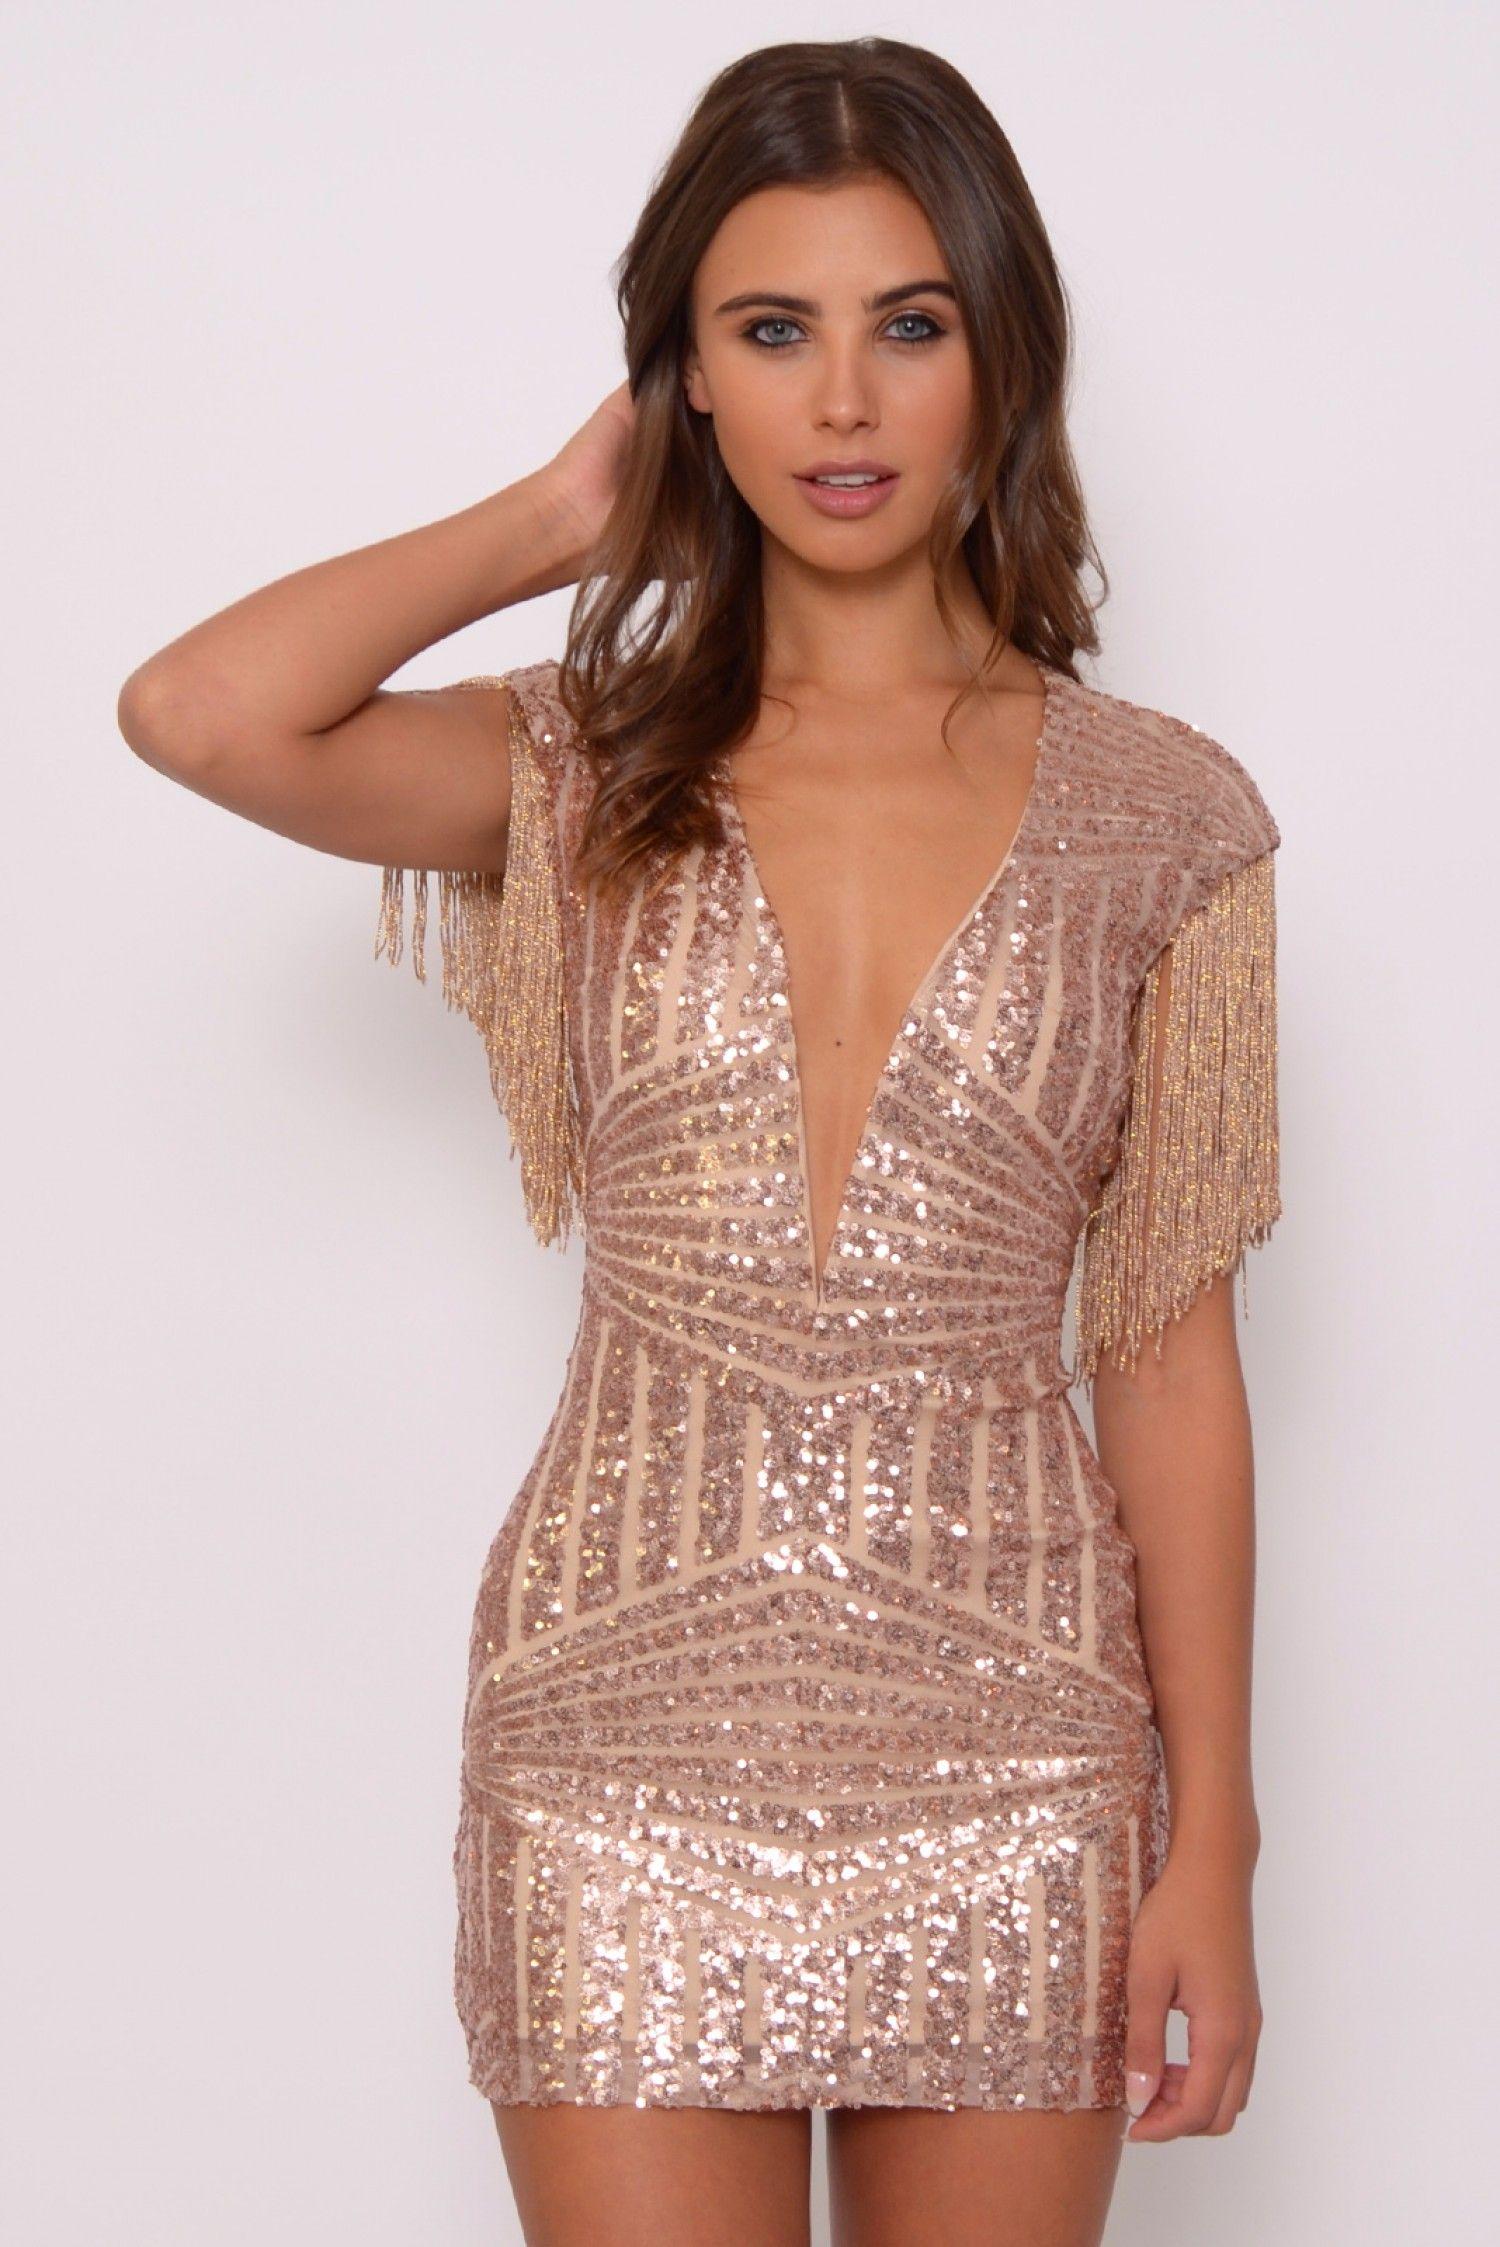 Rose Gold Sequin Cocktail Slip Dress | Sequins, Rose and Gold